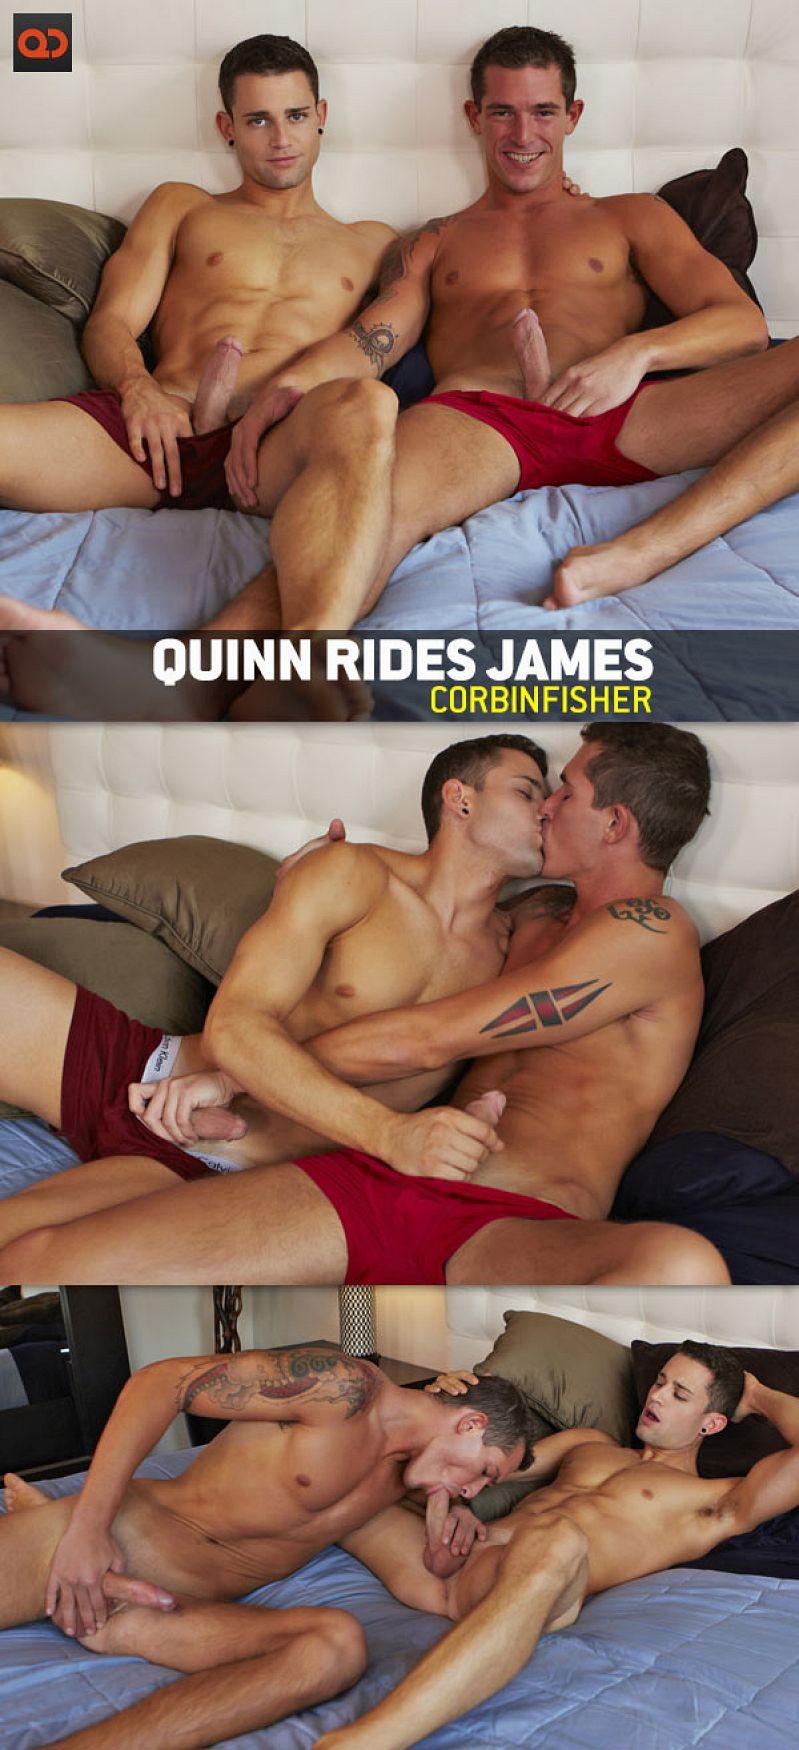 CorbinFisher – Quinn Rides James